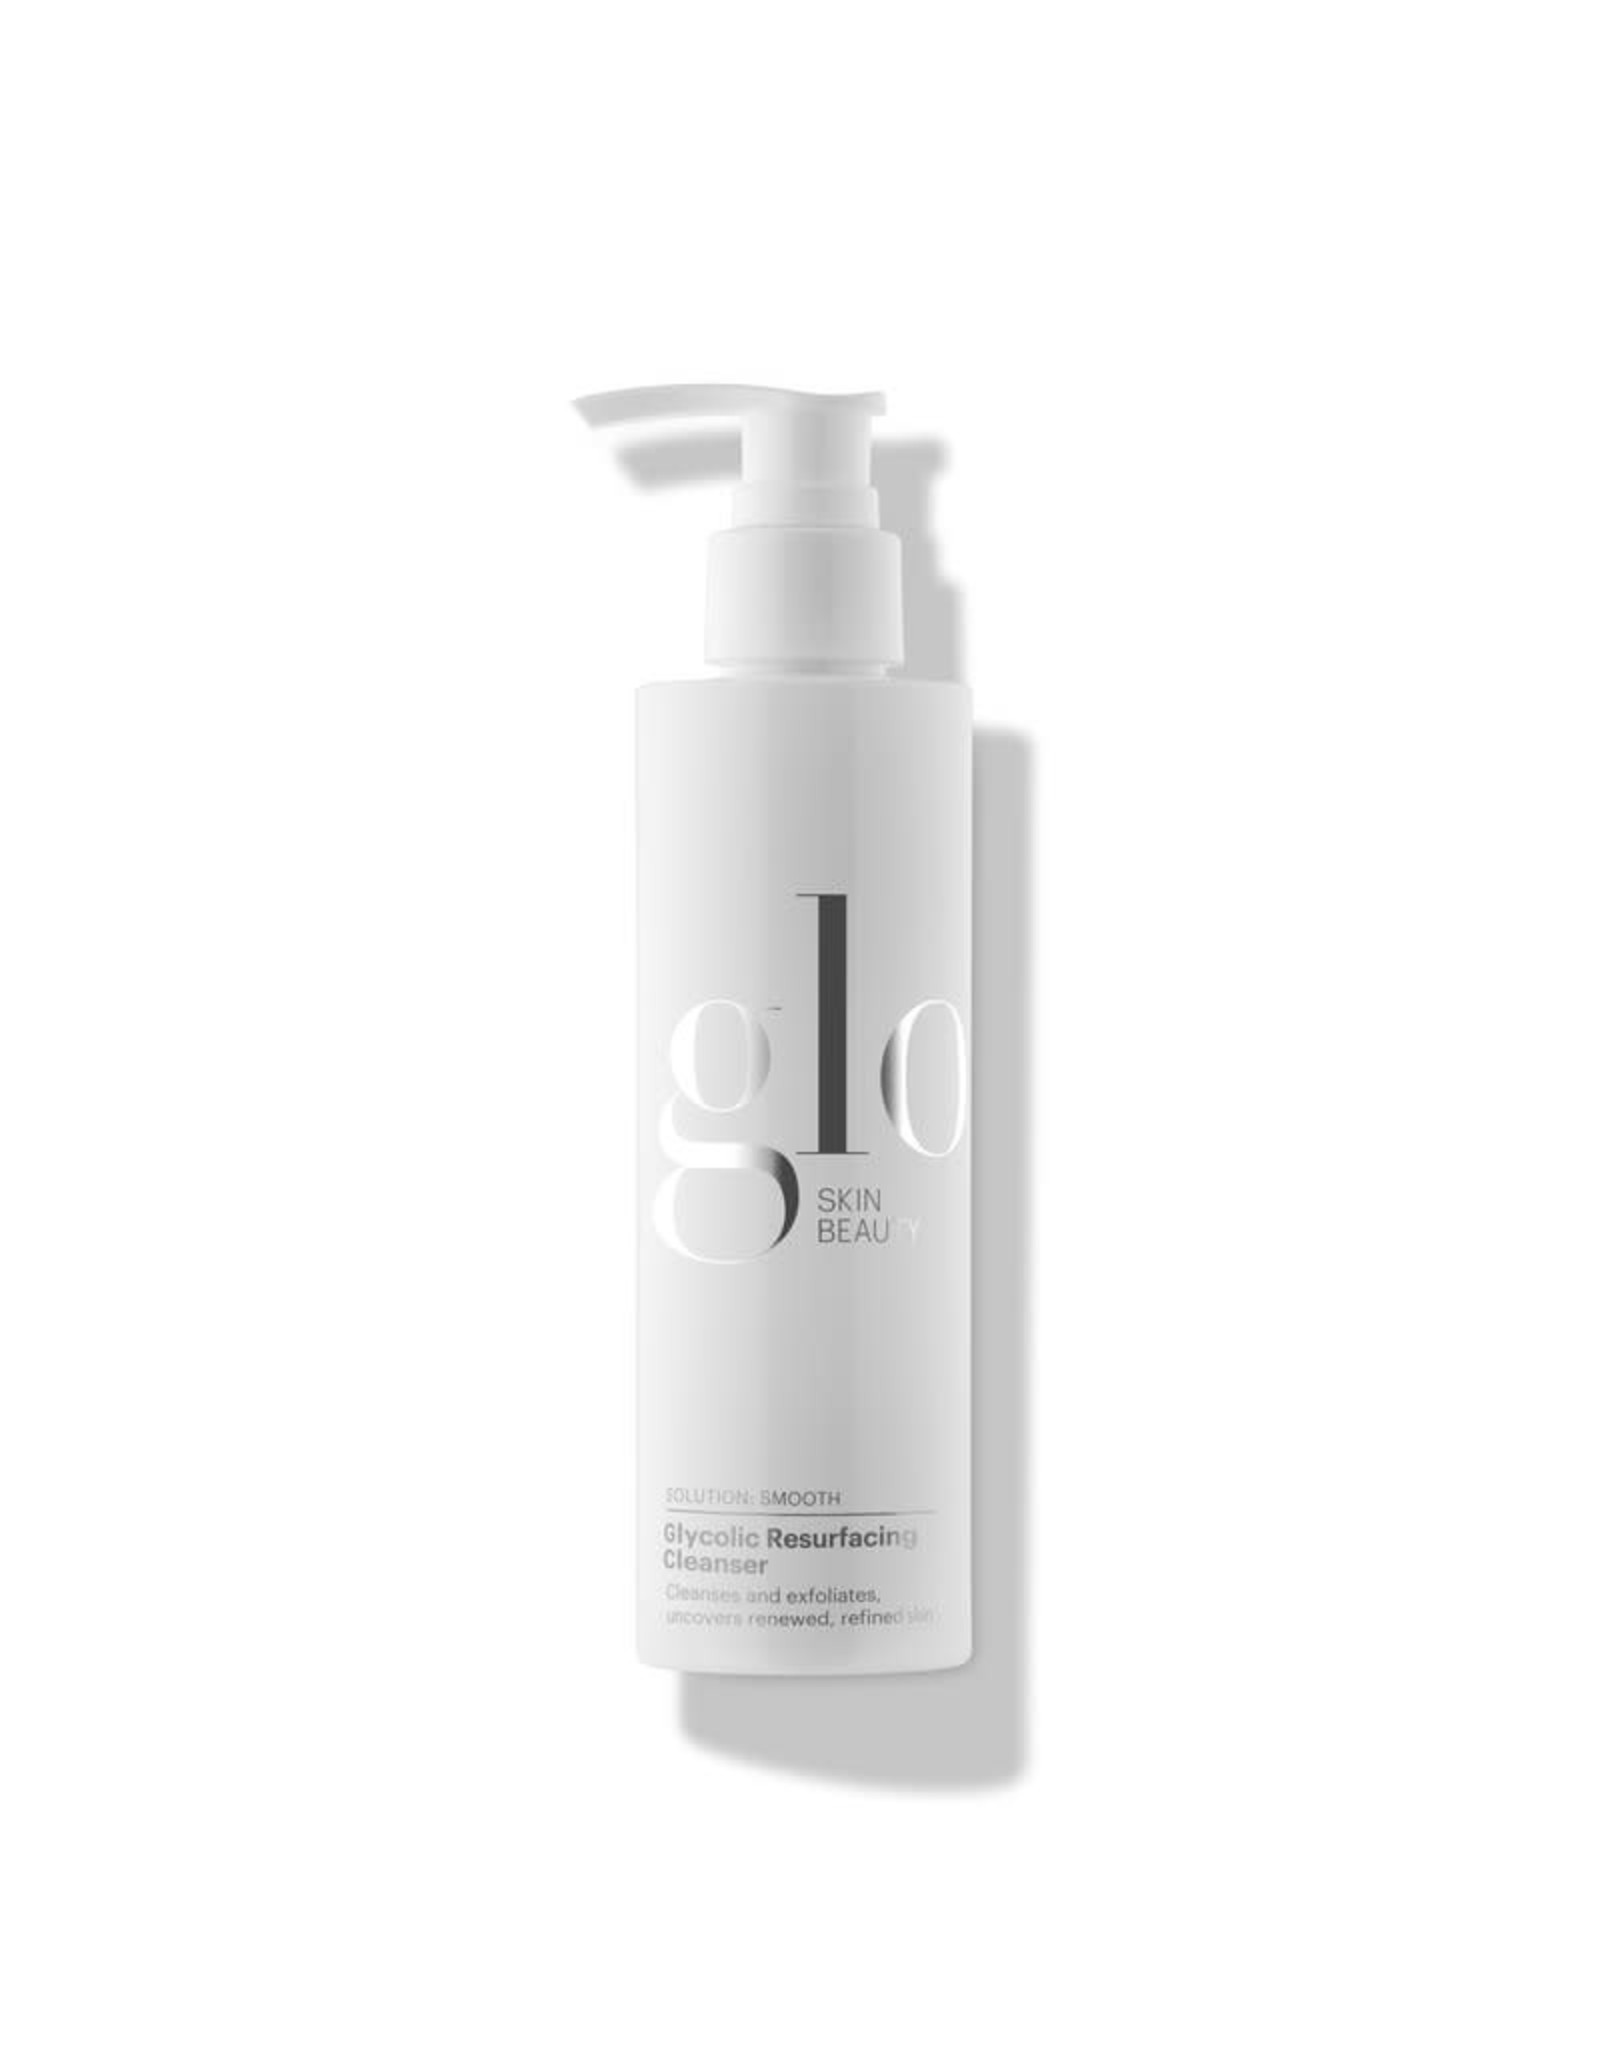 Glo Skin Beauty Glycolic Resurfacing Cleanser